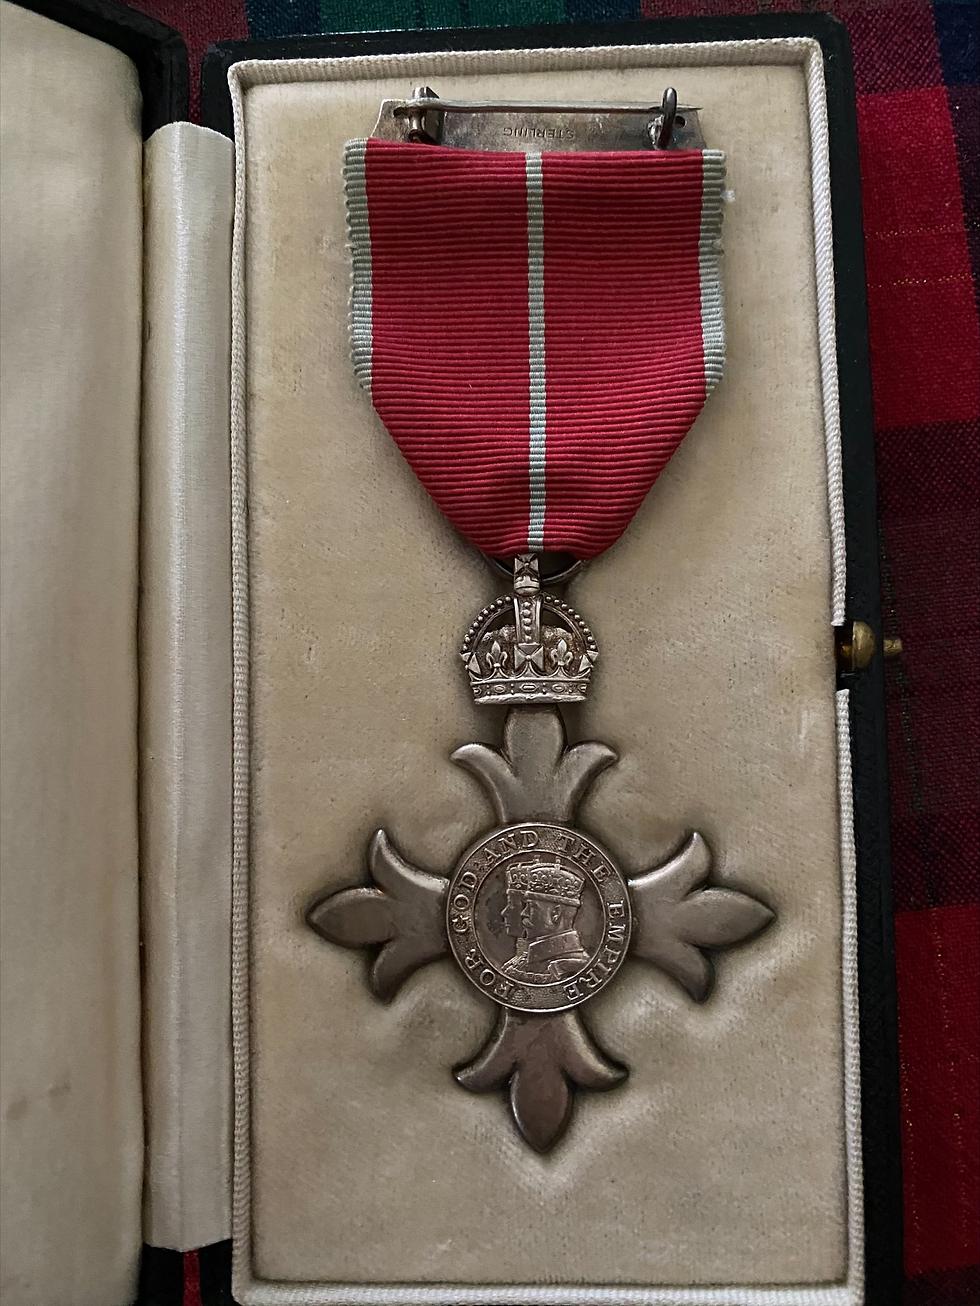 Tenacity MBE medal